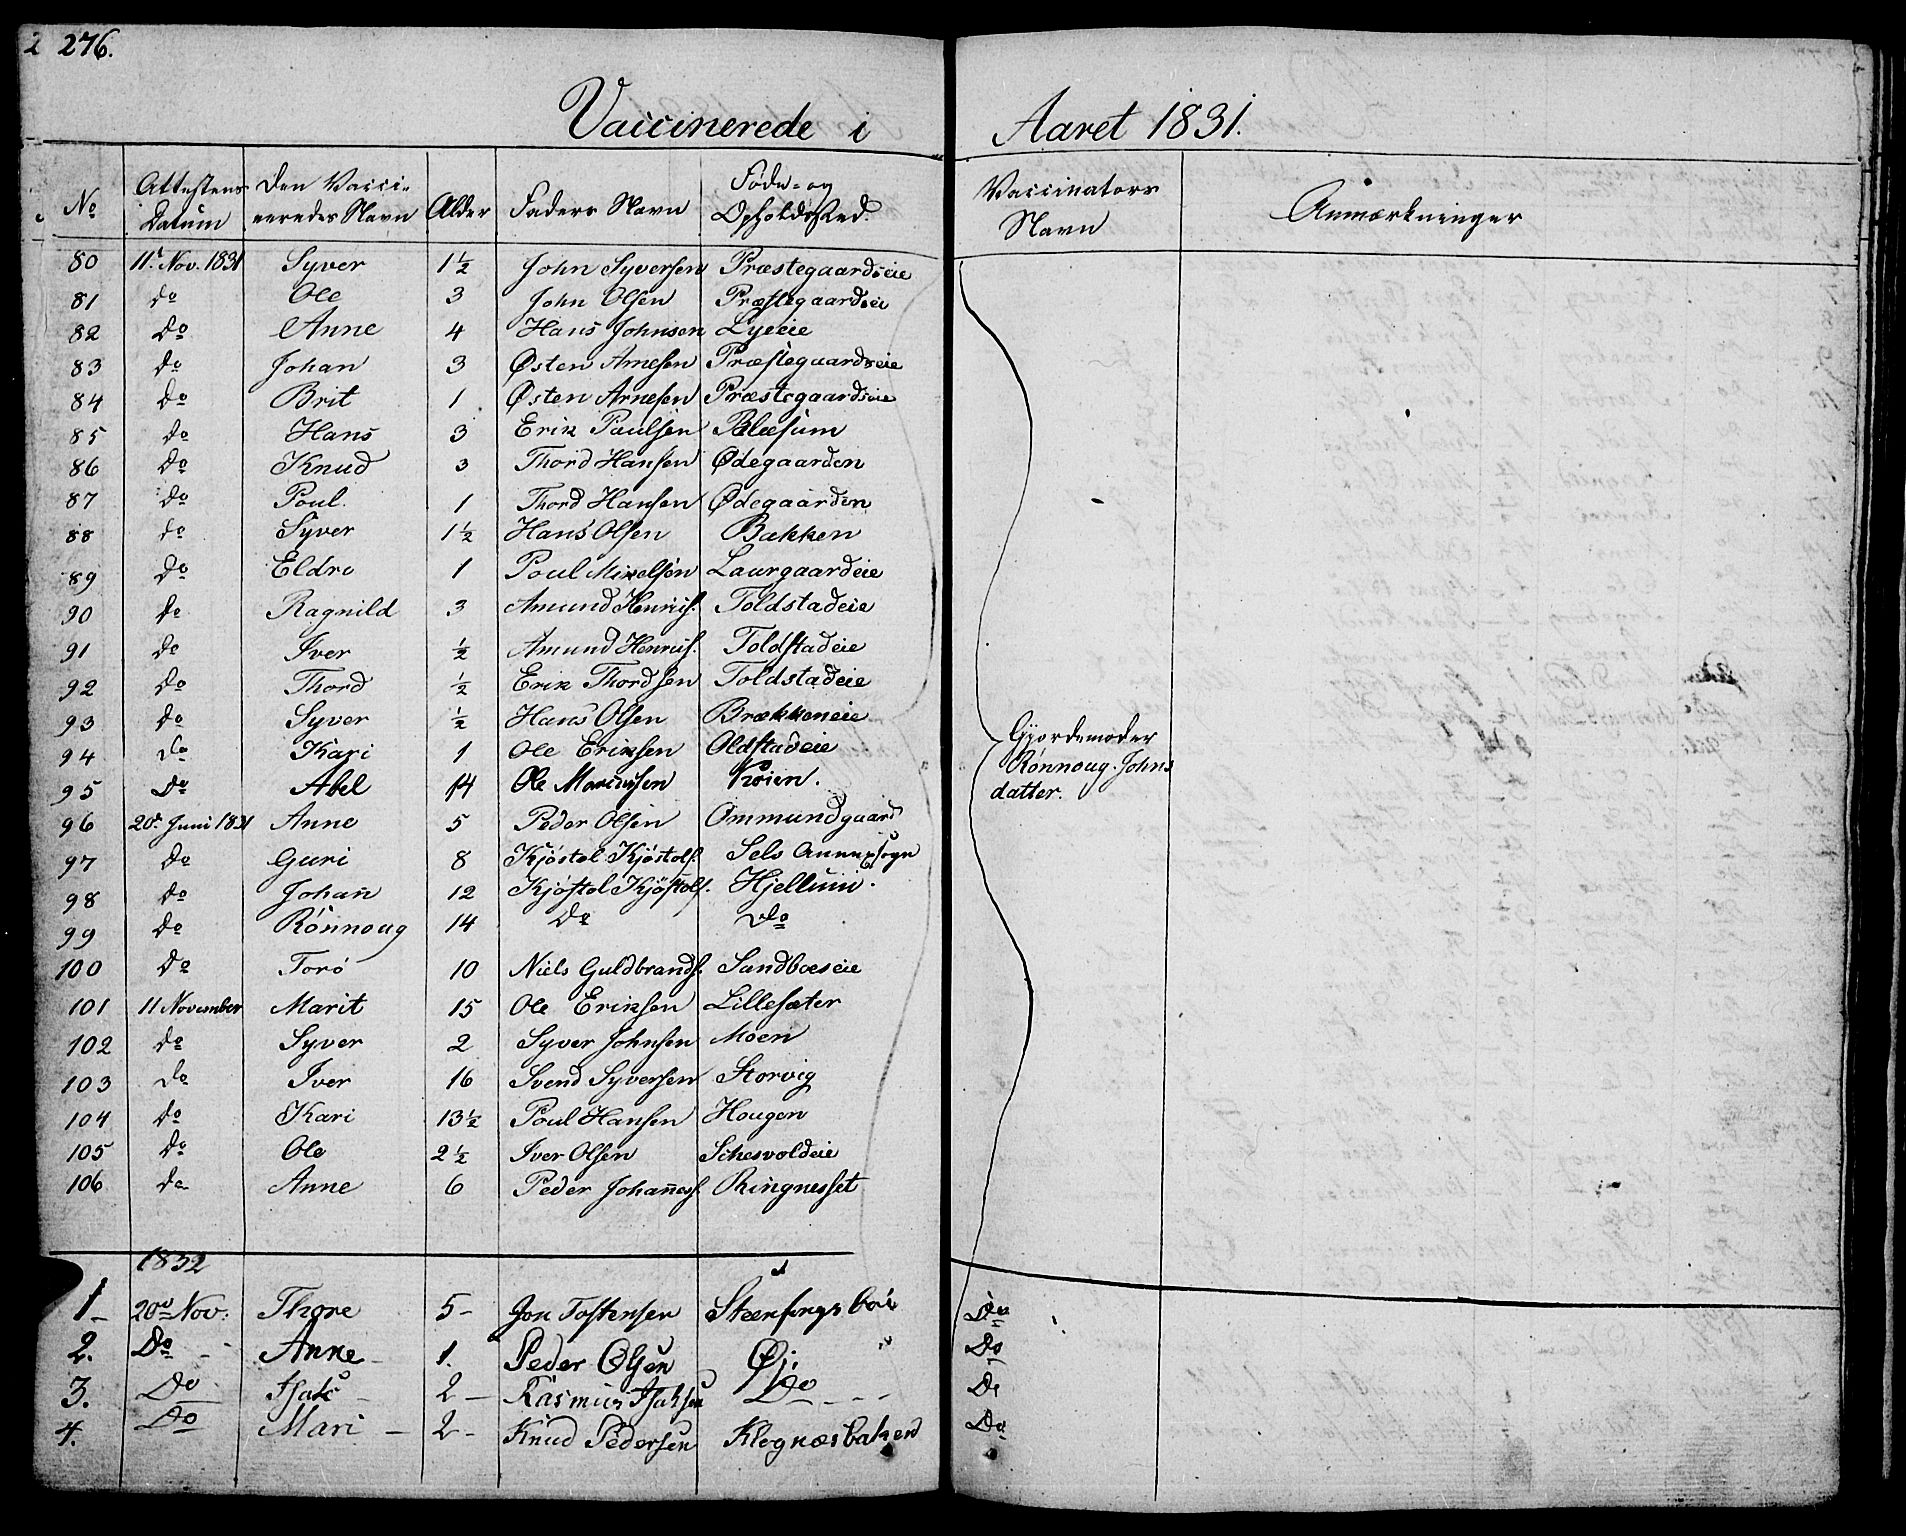 SAH, Vågå prestekontor, Ministerialbok nr. 4 /1, 1827-1842, s. 276